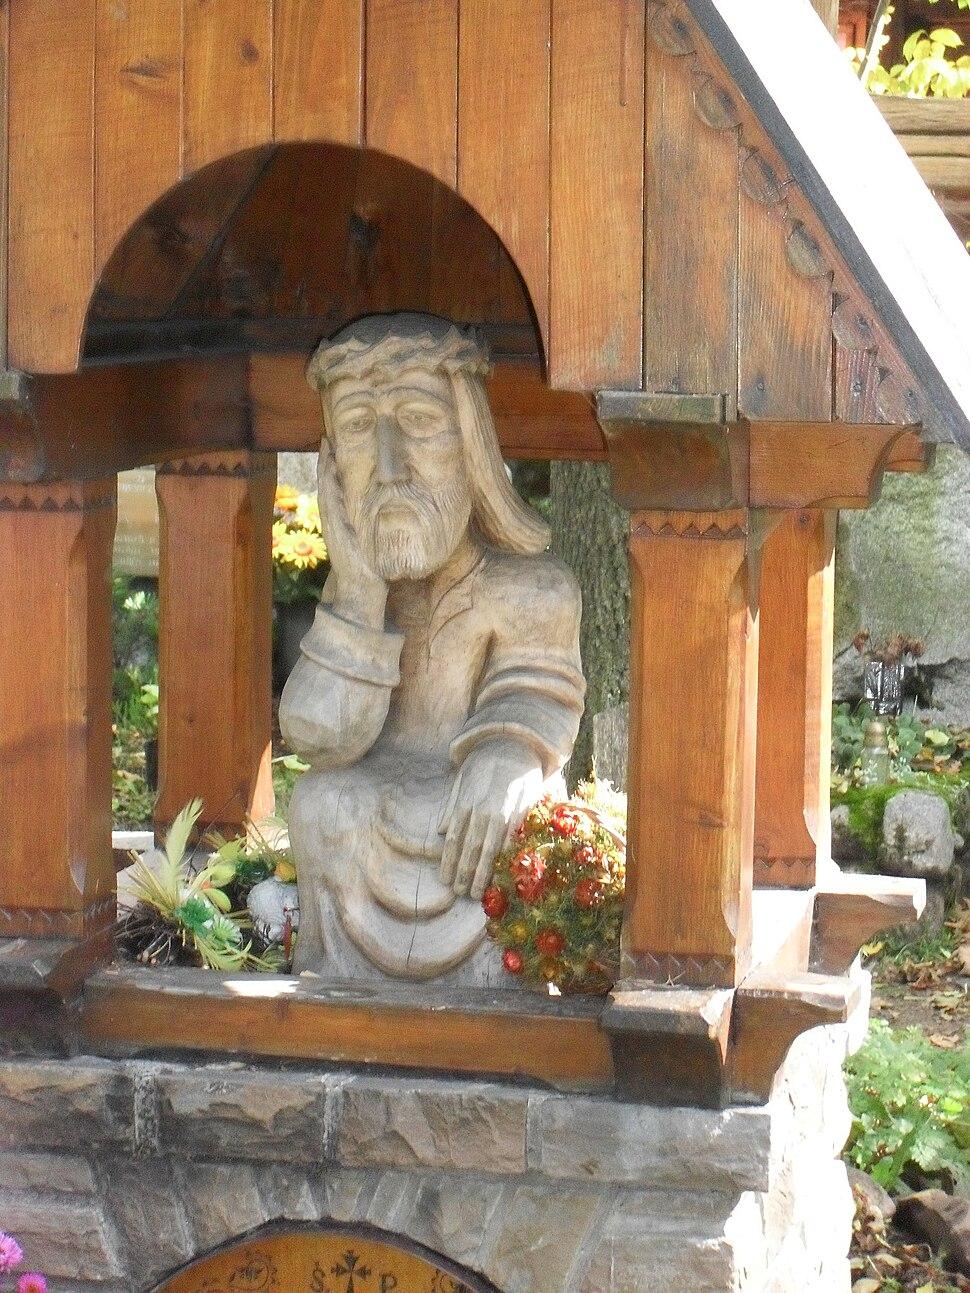 The contemplative Christ of Zakopane